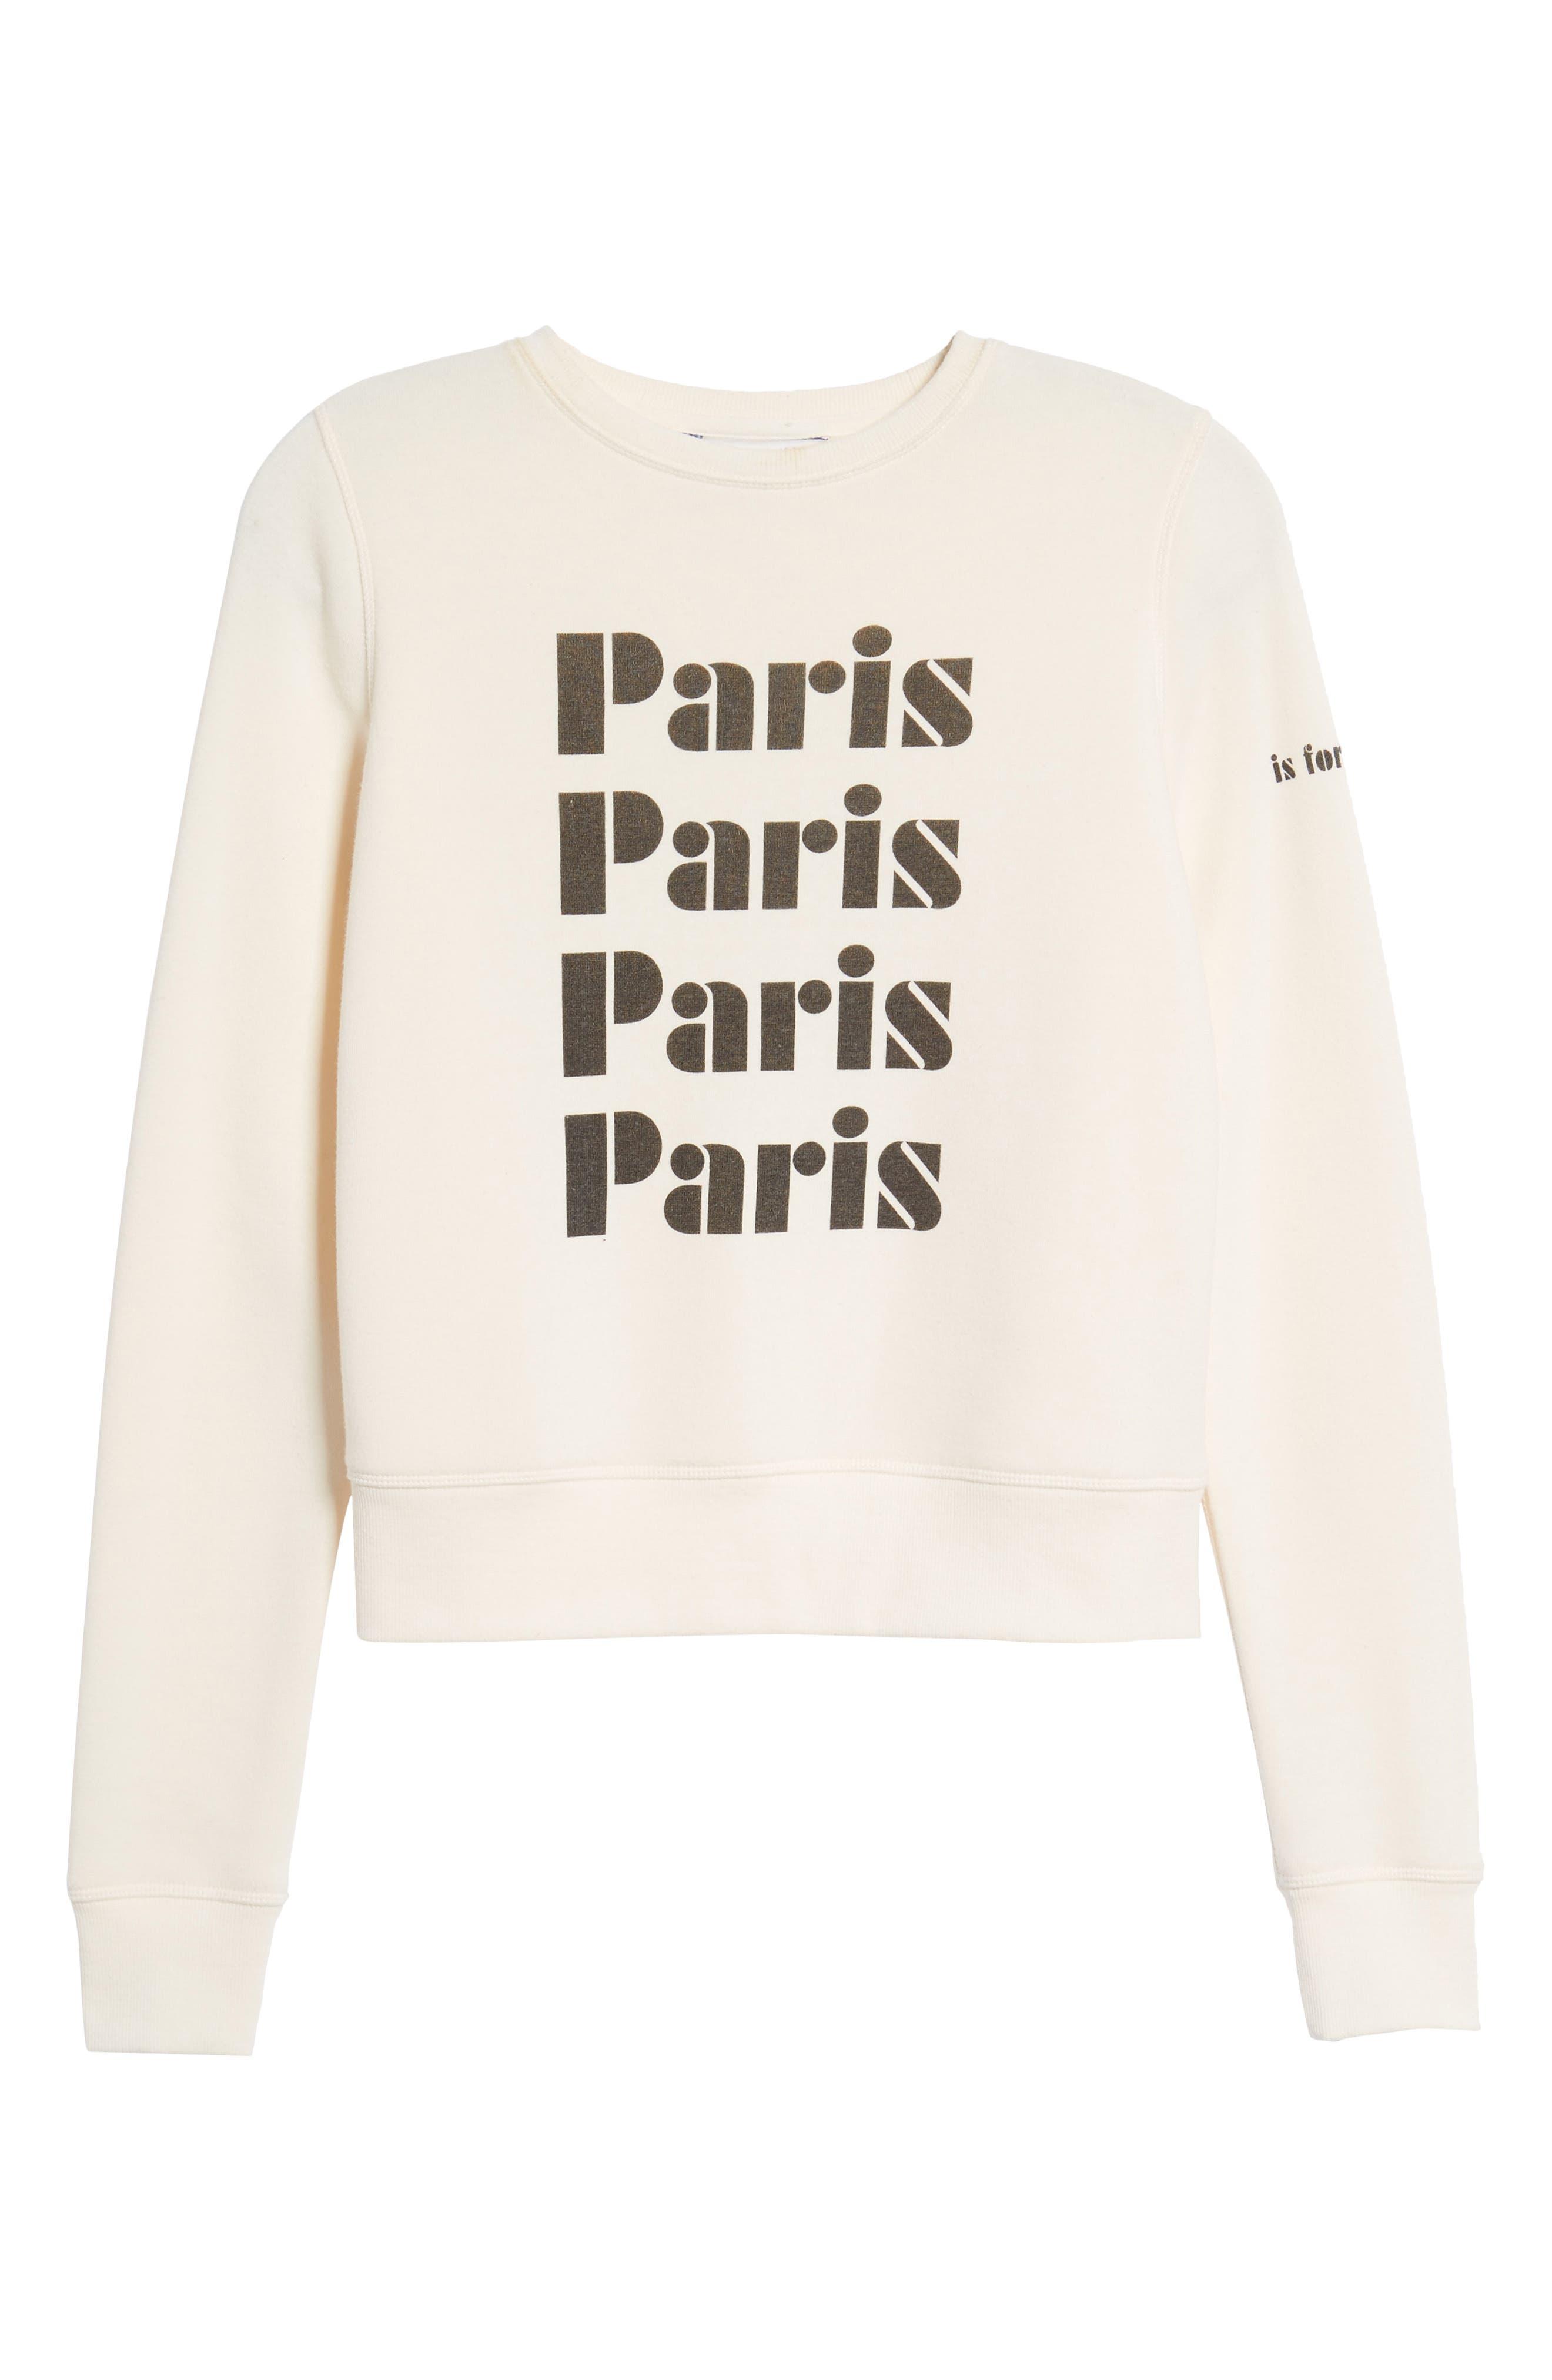 Paris Sweatshirt,                             Alternate thumbnail 6, color,                             Off White/ Black